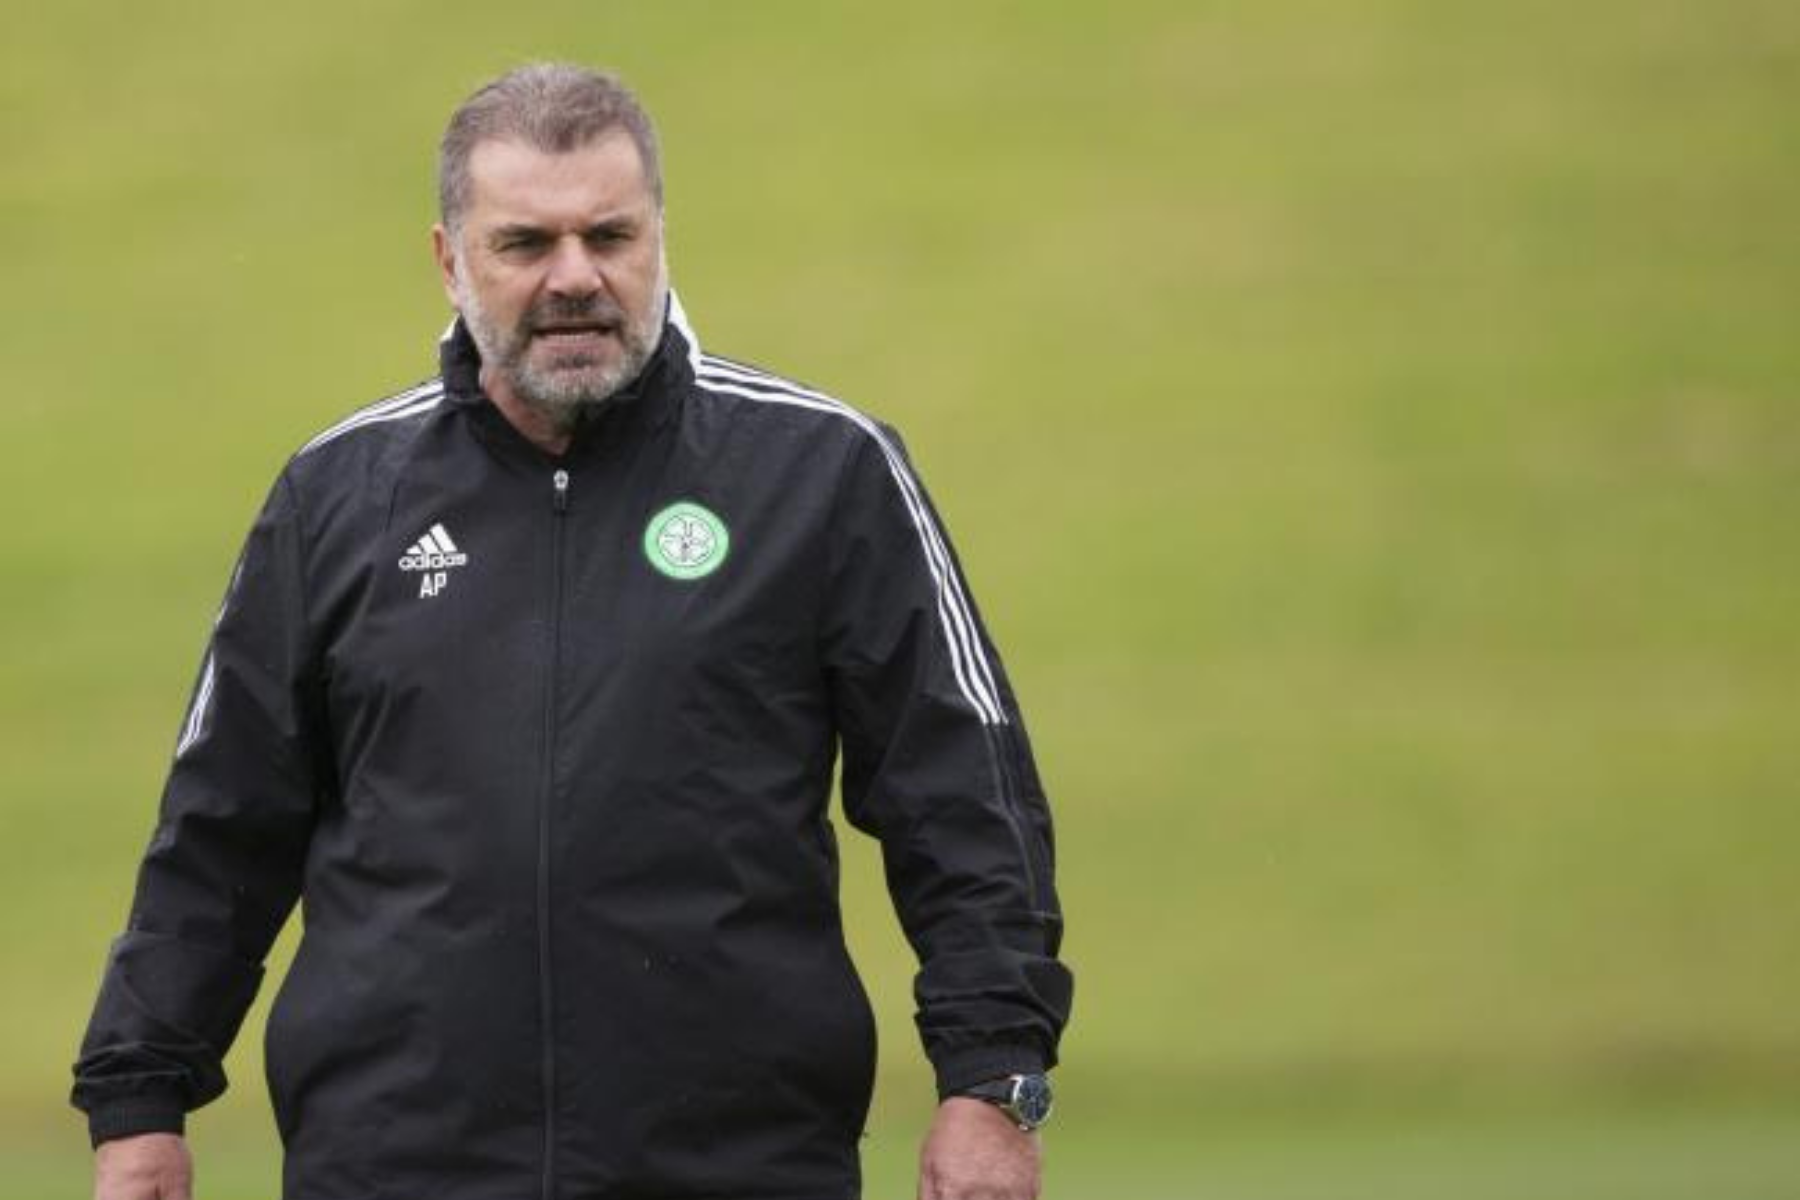 Celtic 3-1 Sheffield Wednesday: Ajeti and Edouard on target in opening win for Ange Postecoglou